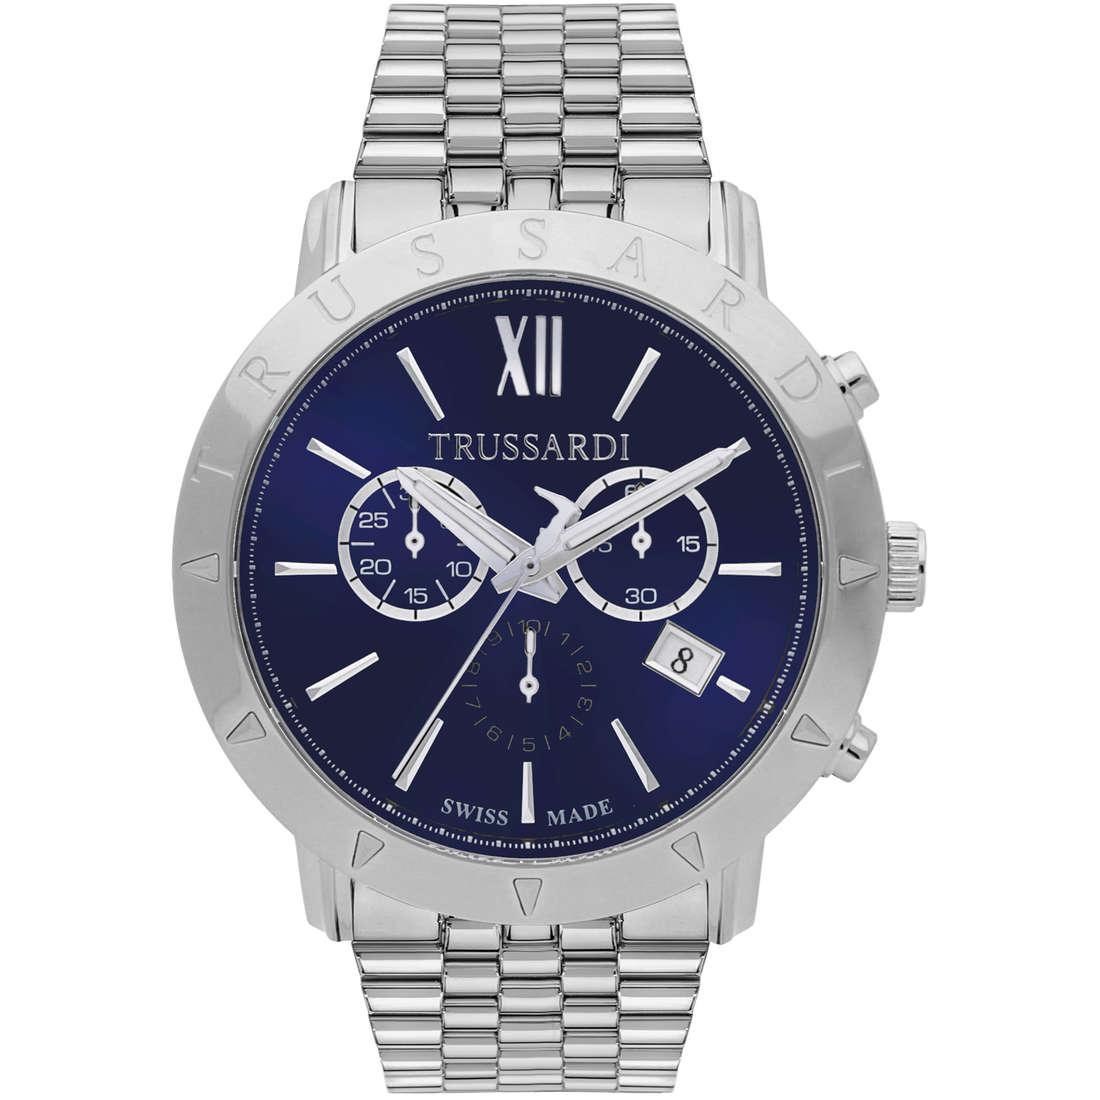 watch chronograph man Trussardi Nestor R2473607002